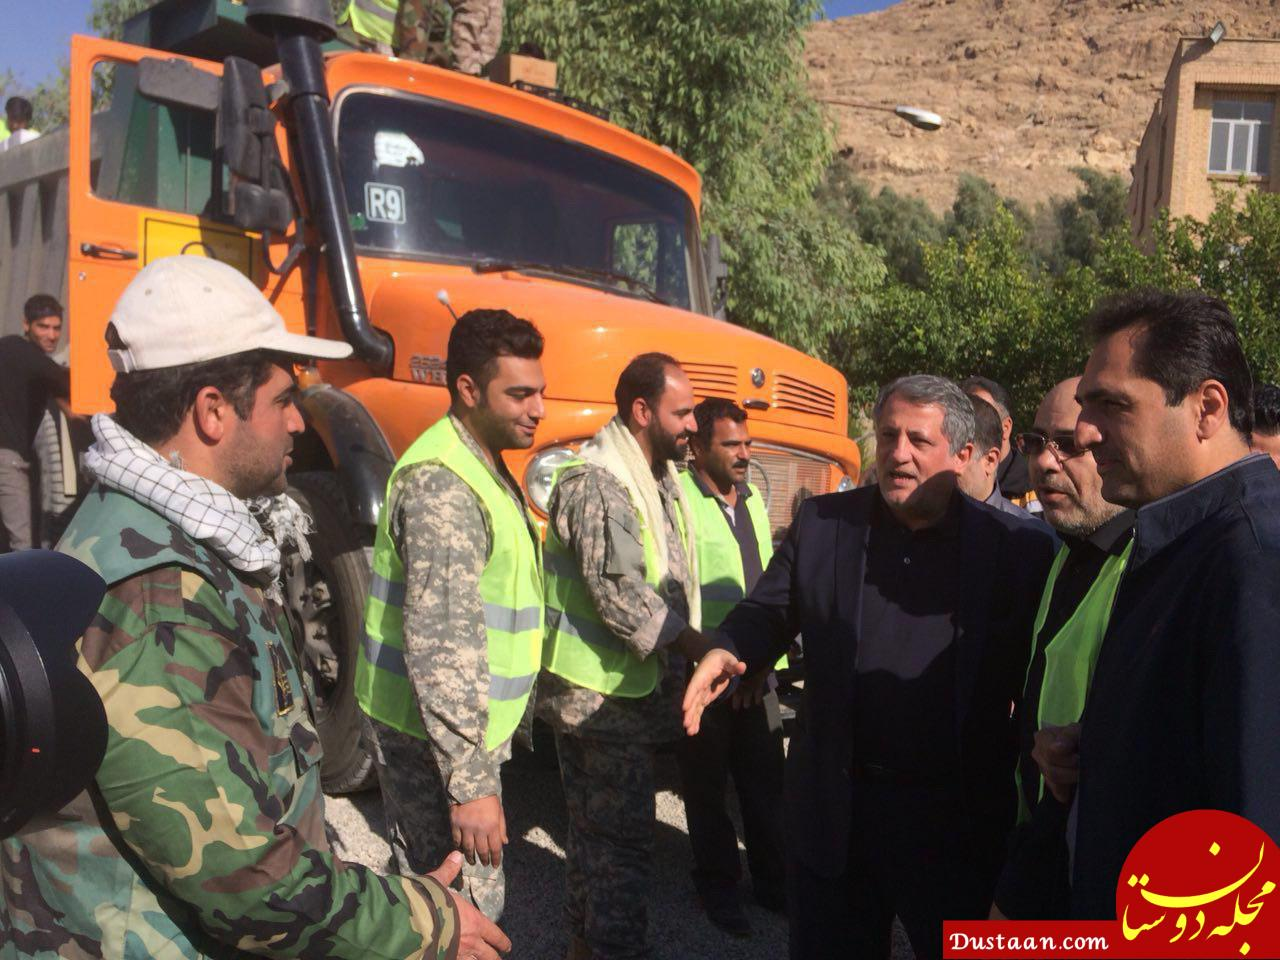 www.dustaan.com محسن هاشمی در میان زلزله زدگان کرمانشاه +عکس